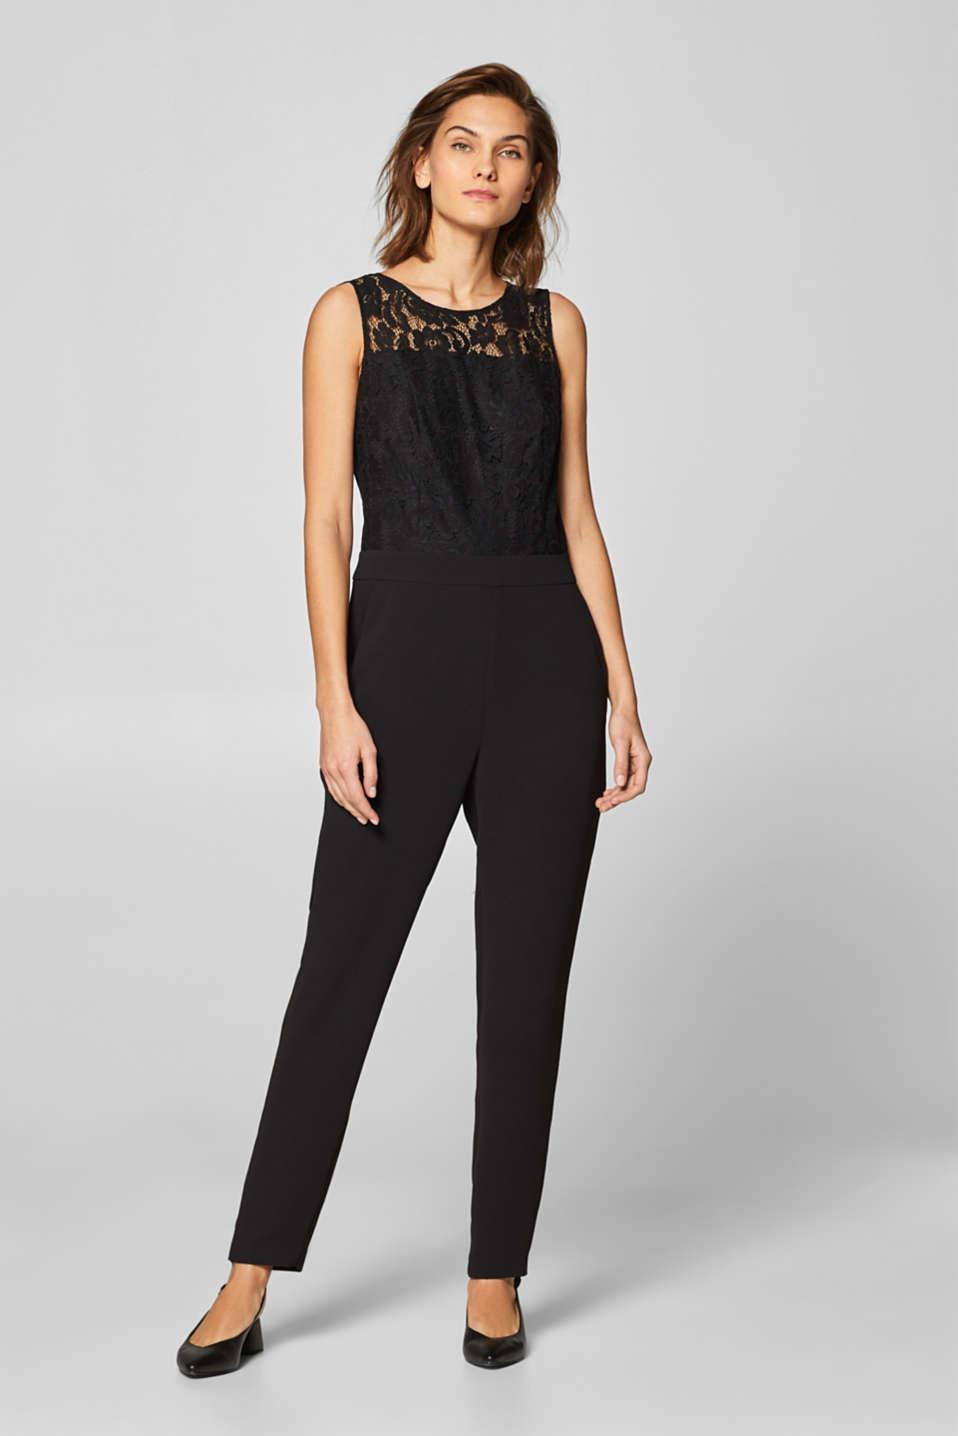 2afeecbf2e50 Esprit - Jumpsuit i spets och crepetyg i Esprits Online-Shop